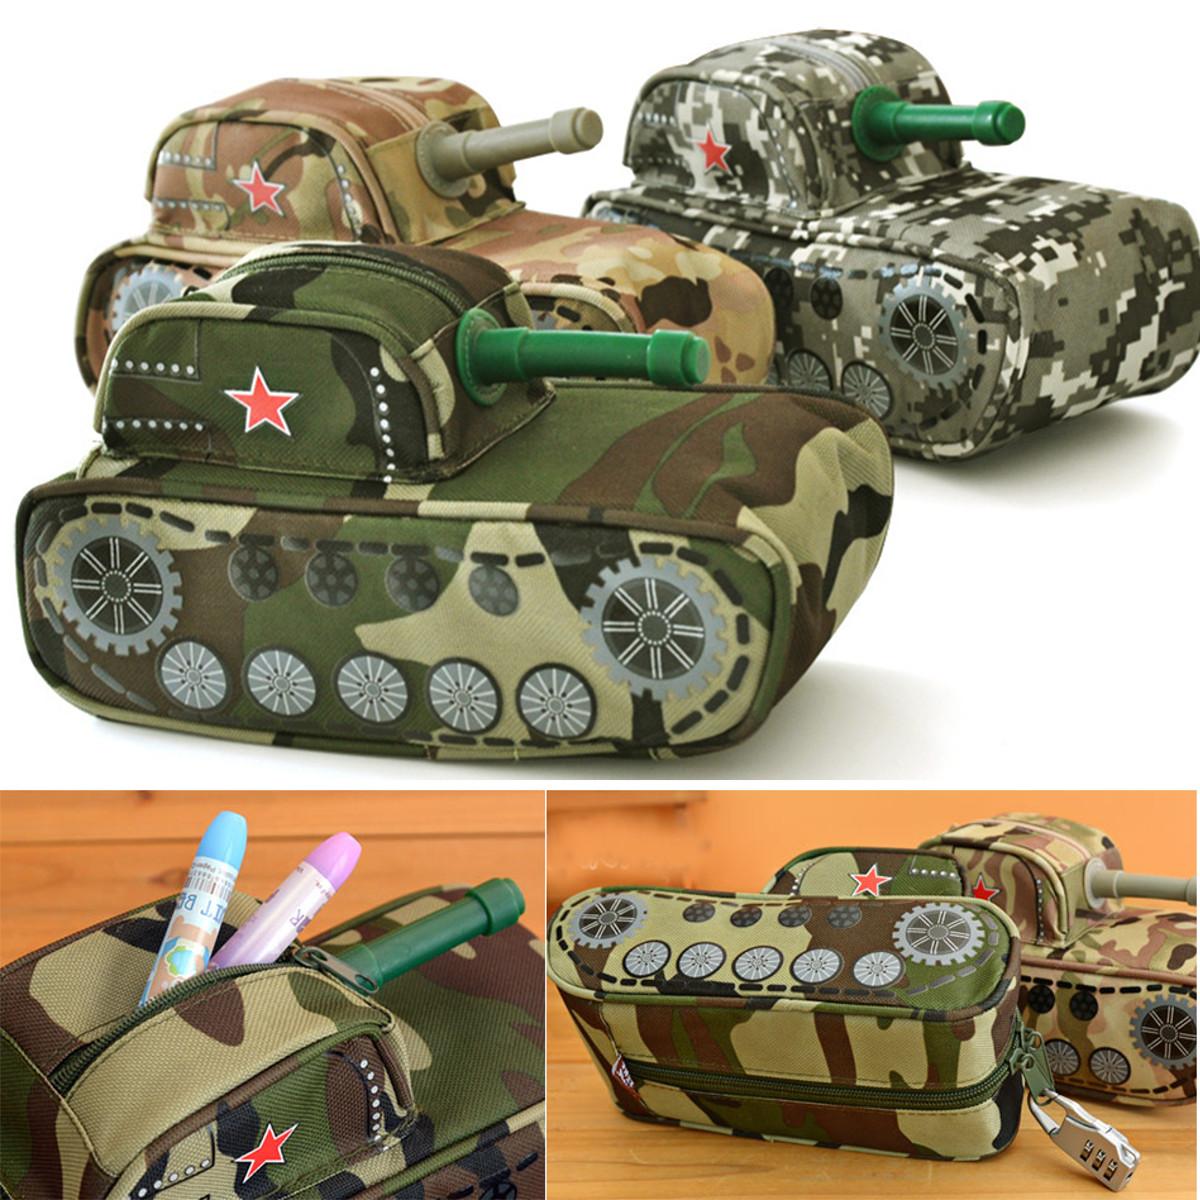 Cool Tank Shape Pencil Case Bag Pen Box Stationery Boy's School Pen Case Purse Fountain Pen Case